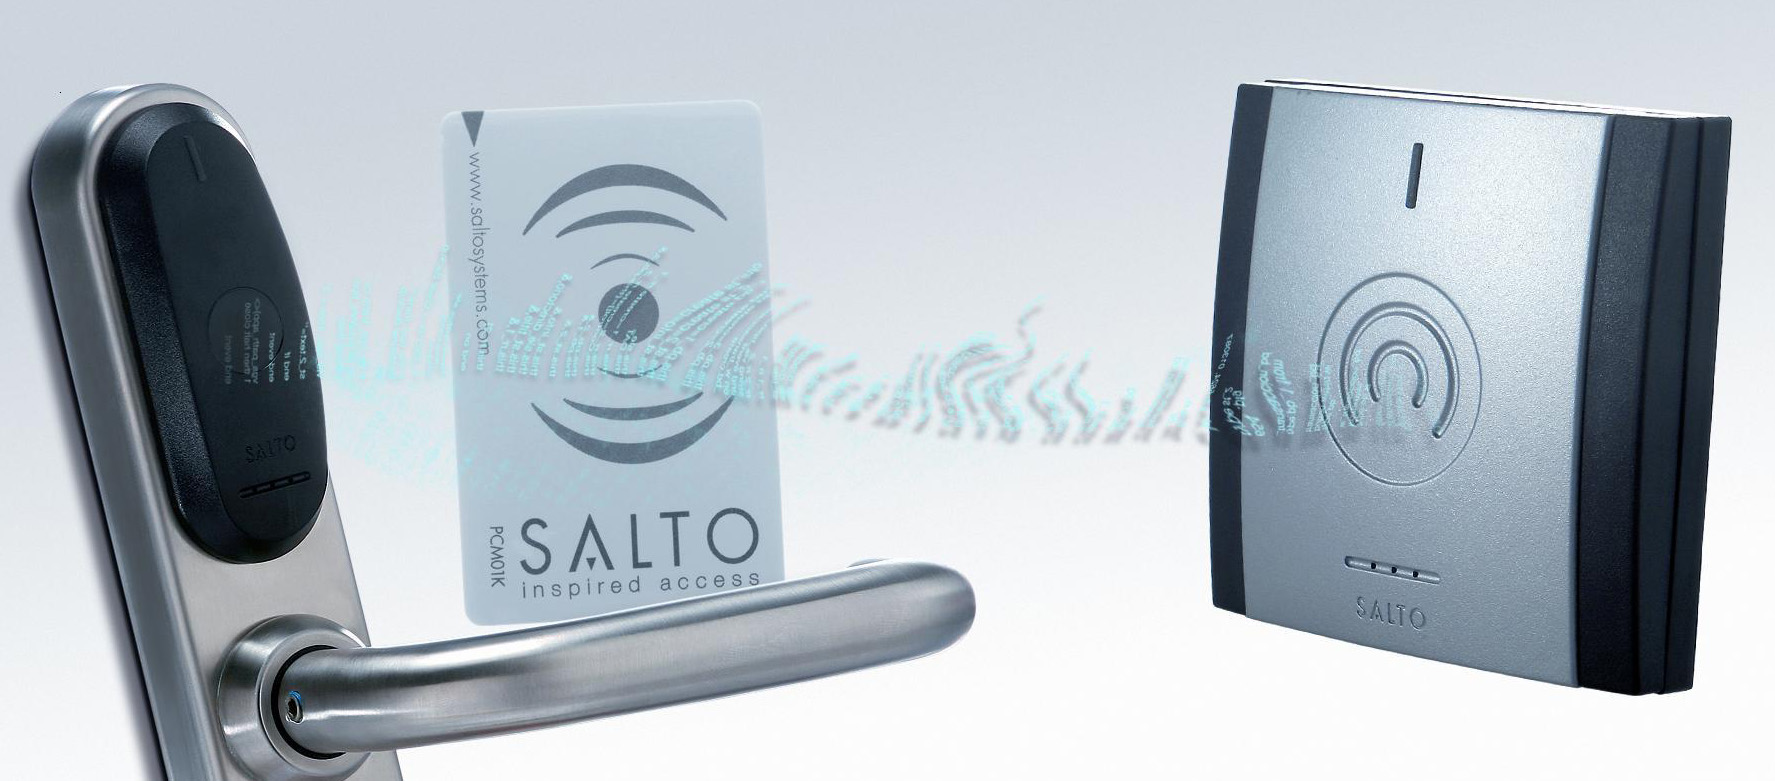 Salto Network